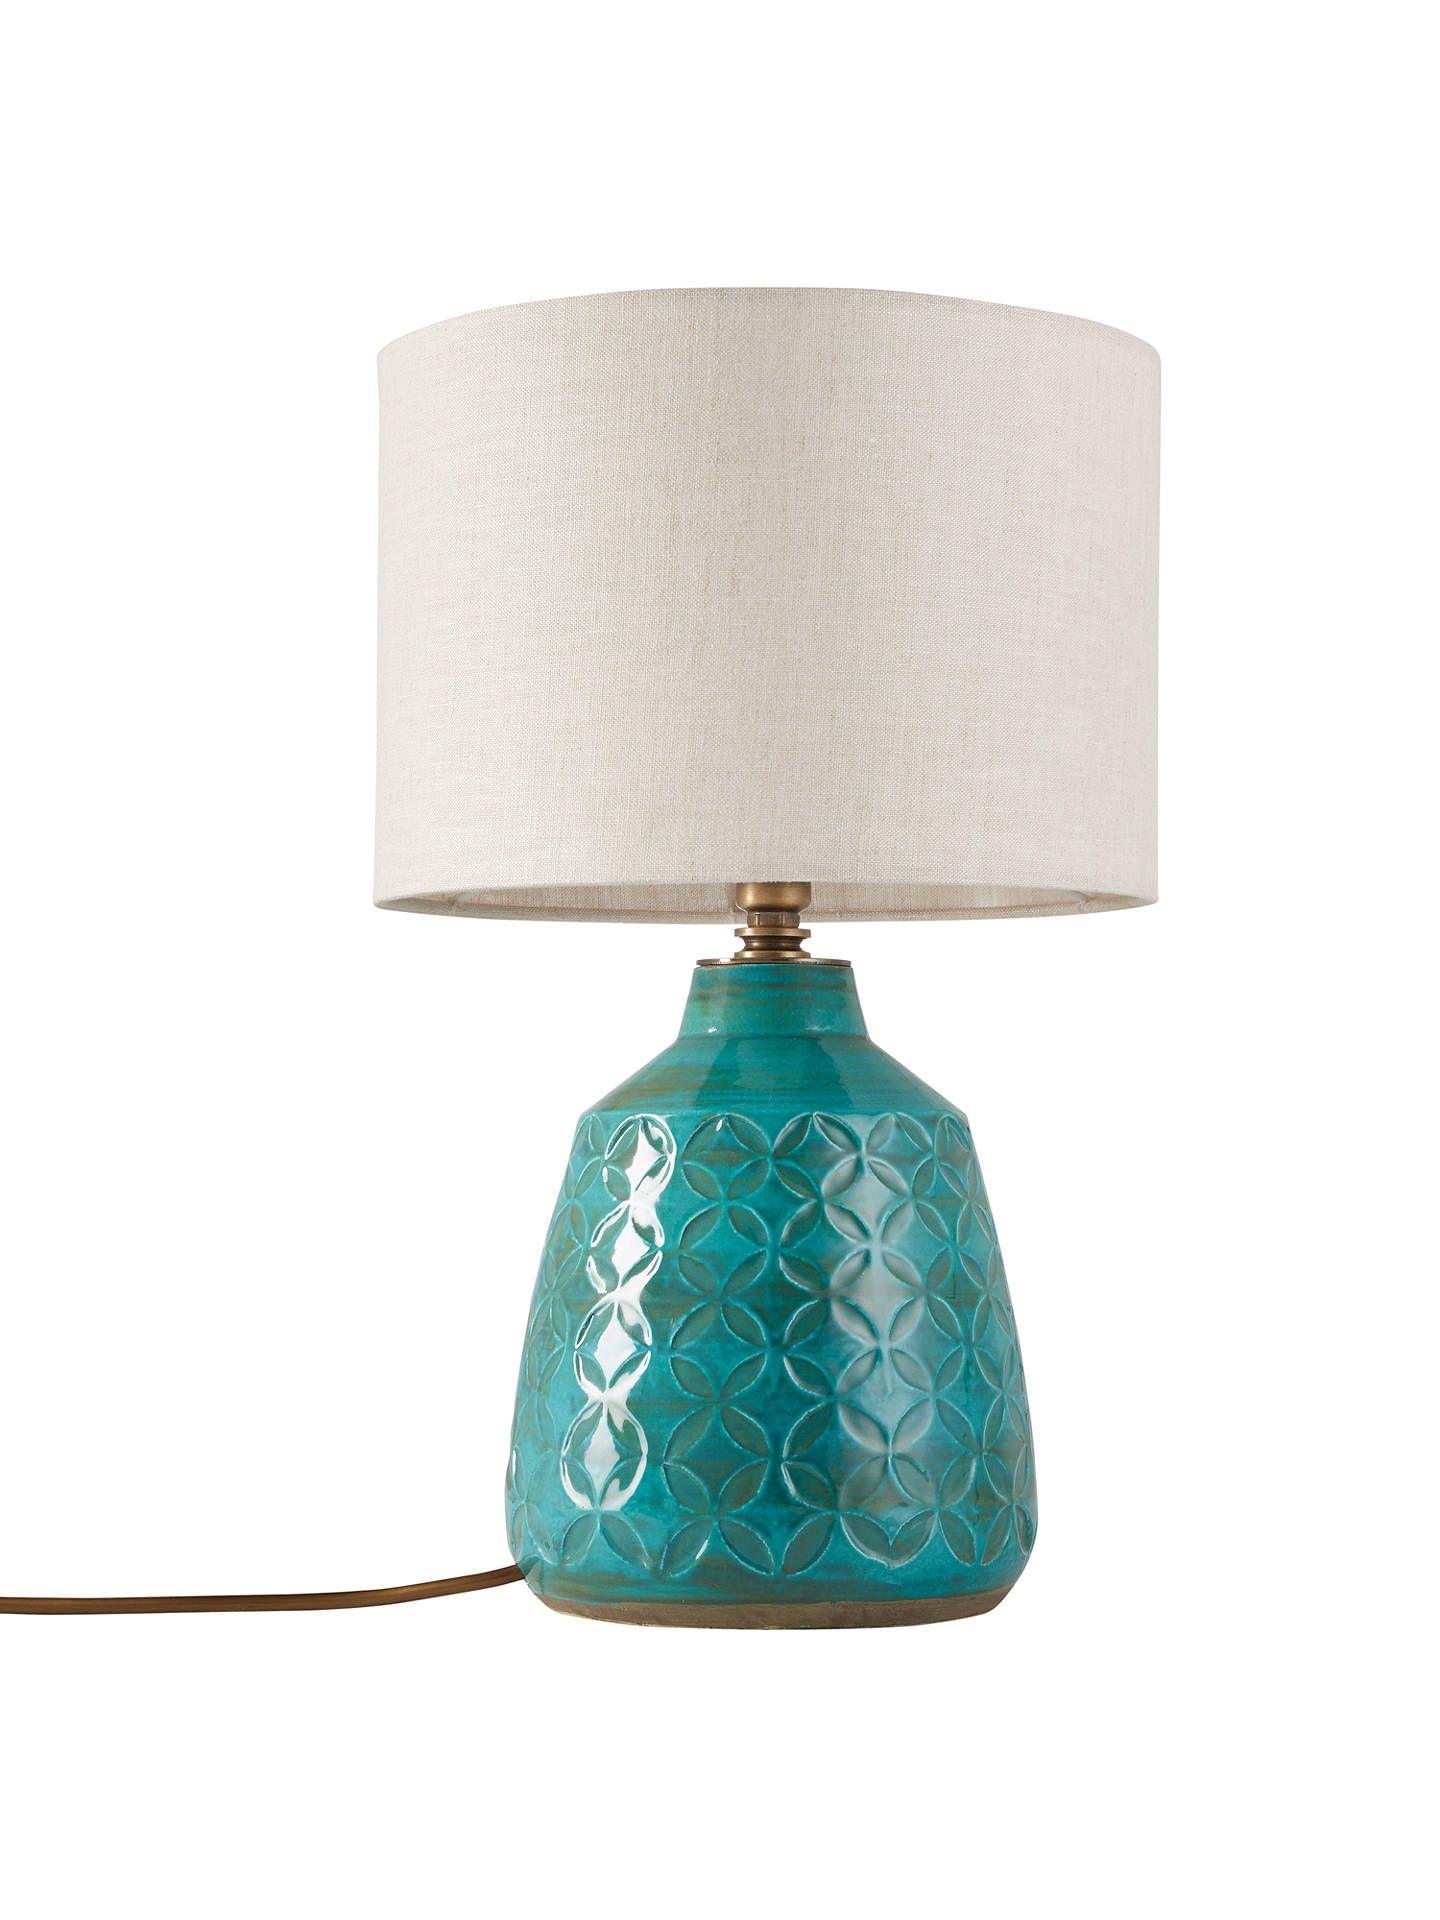 John Lewis & Partners Samara Ceramic Lamp Base, Green